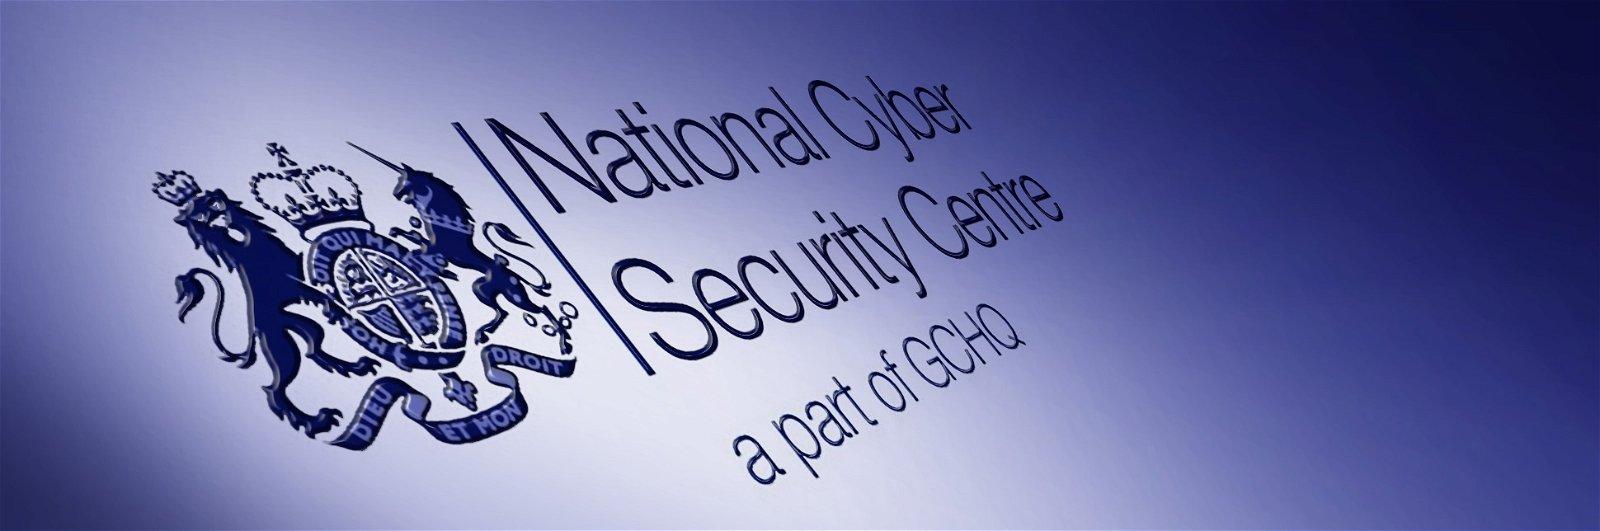 NCSCLogo3 - property management software